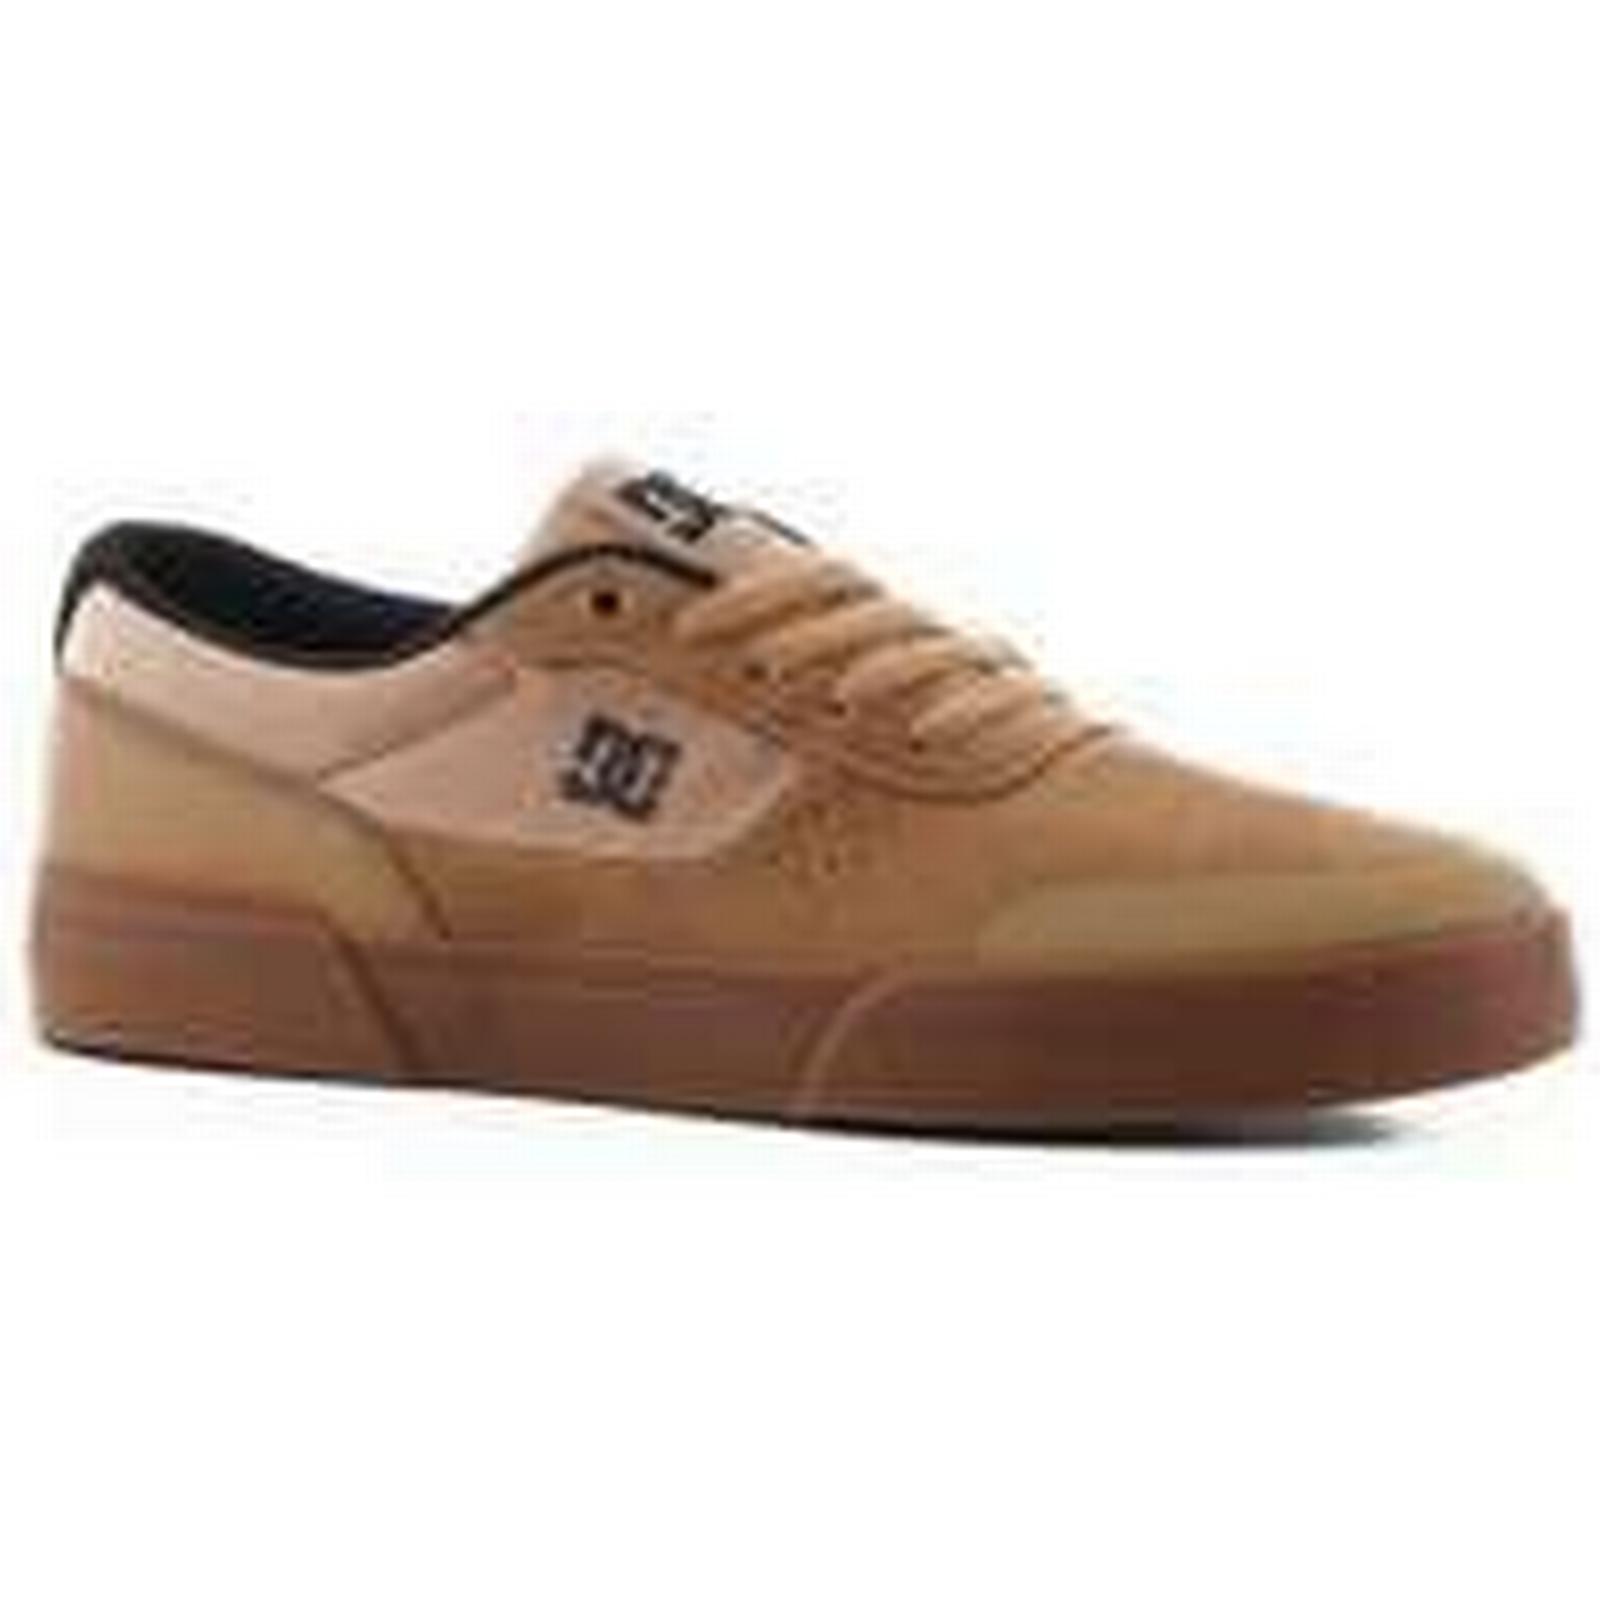 DC Skate Shoes Switch Plus S Skate DC Shoes brown/gum 1a0ca0